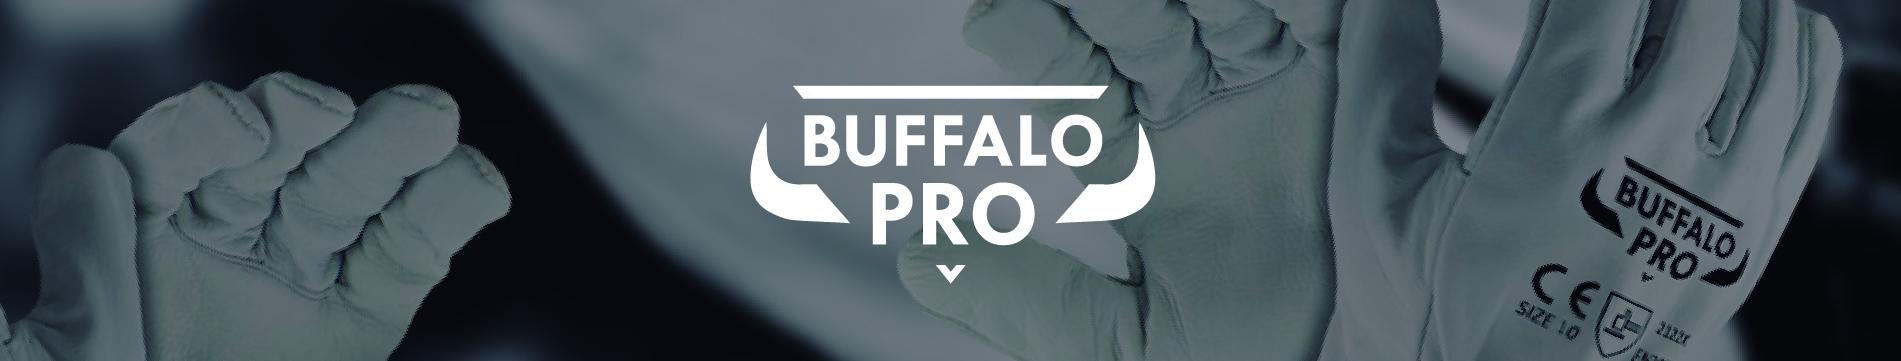 Buffalo pro